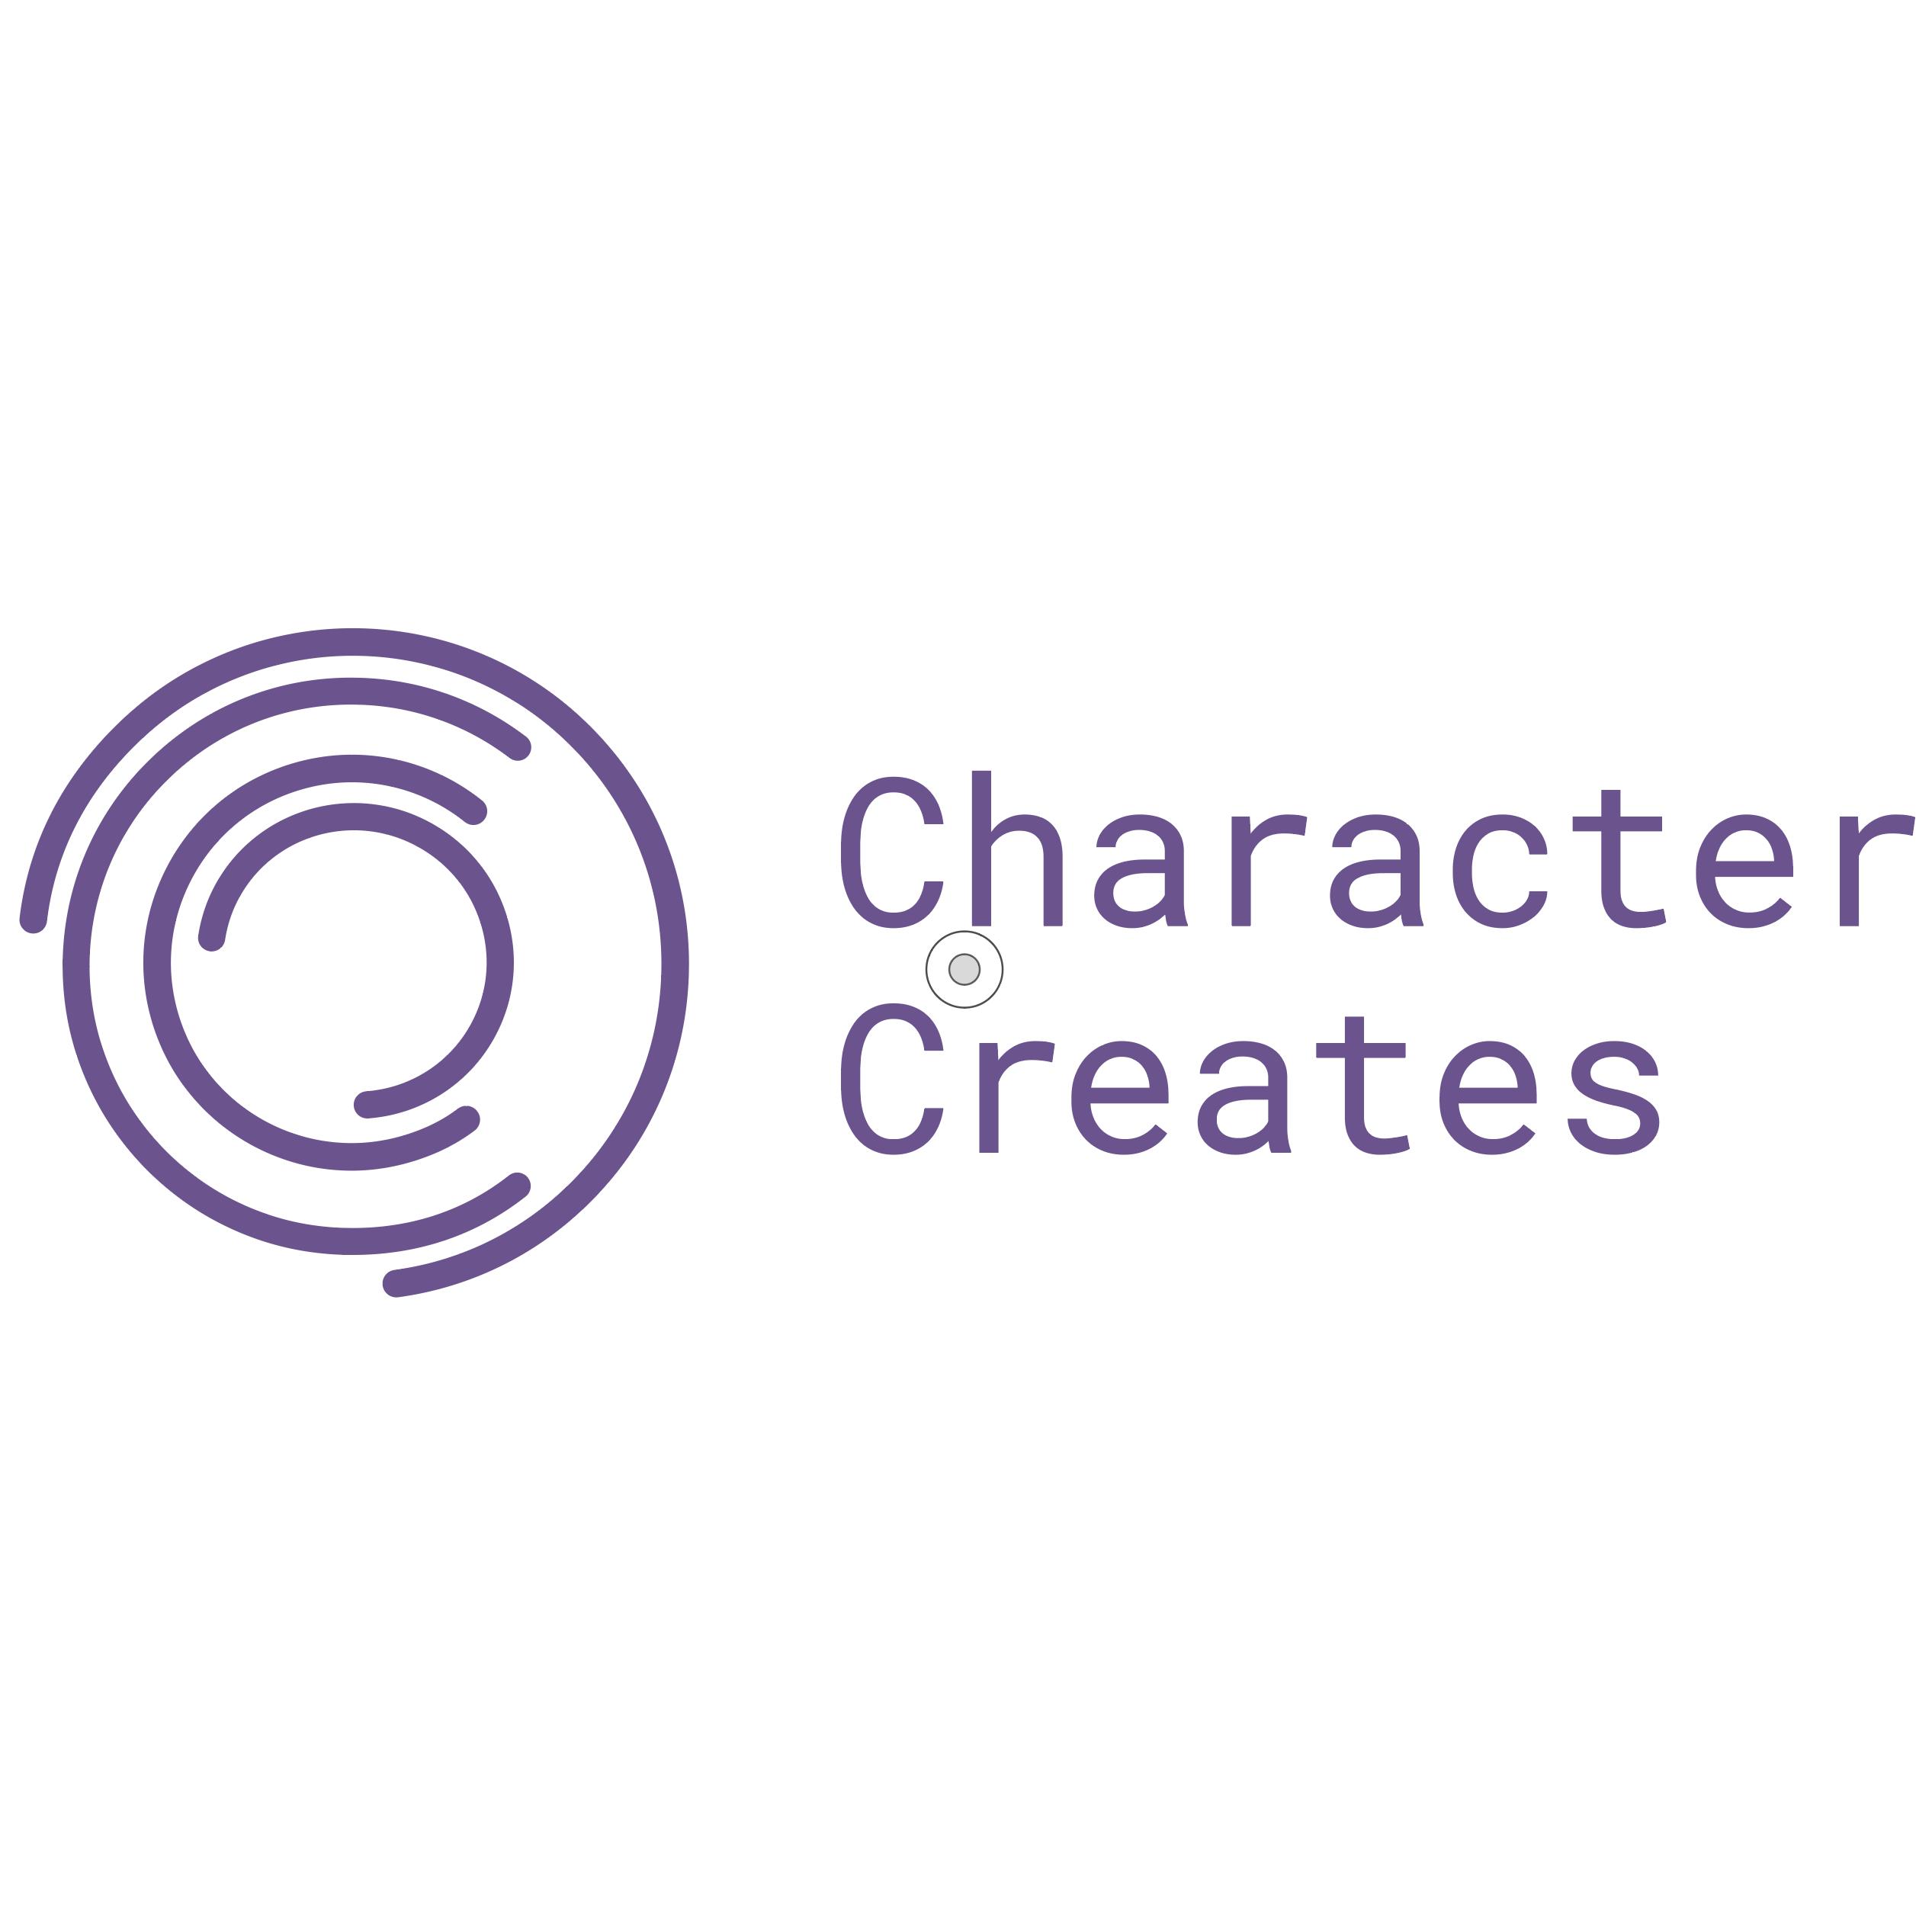 Character Creates